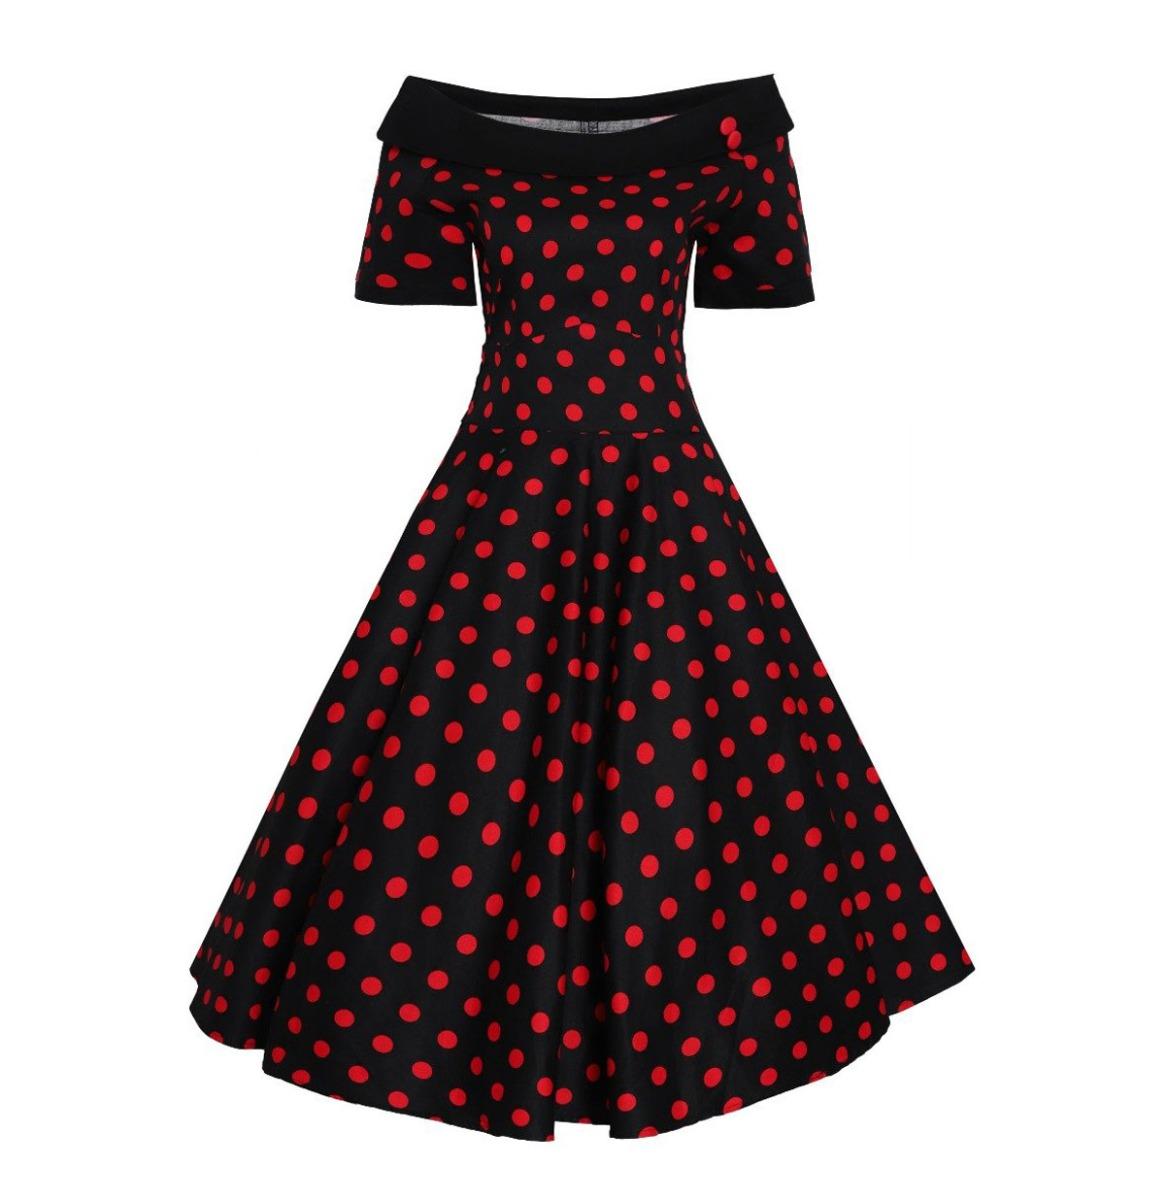 Dolly & Dotty Darlene Dress Zwart Rood Polka